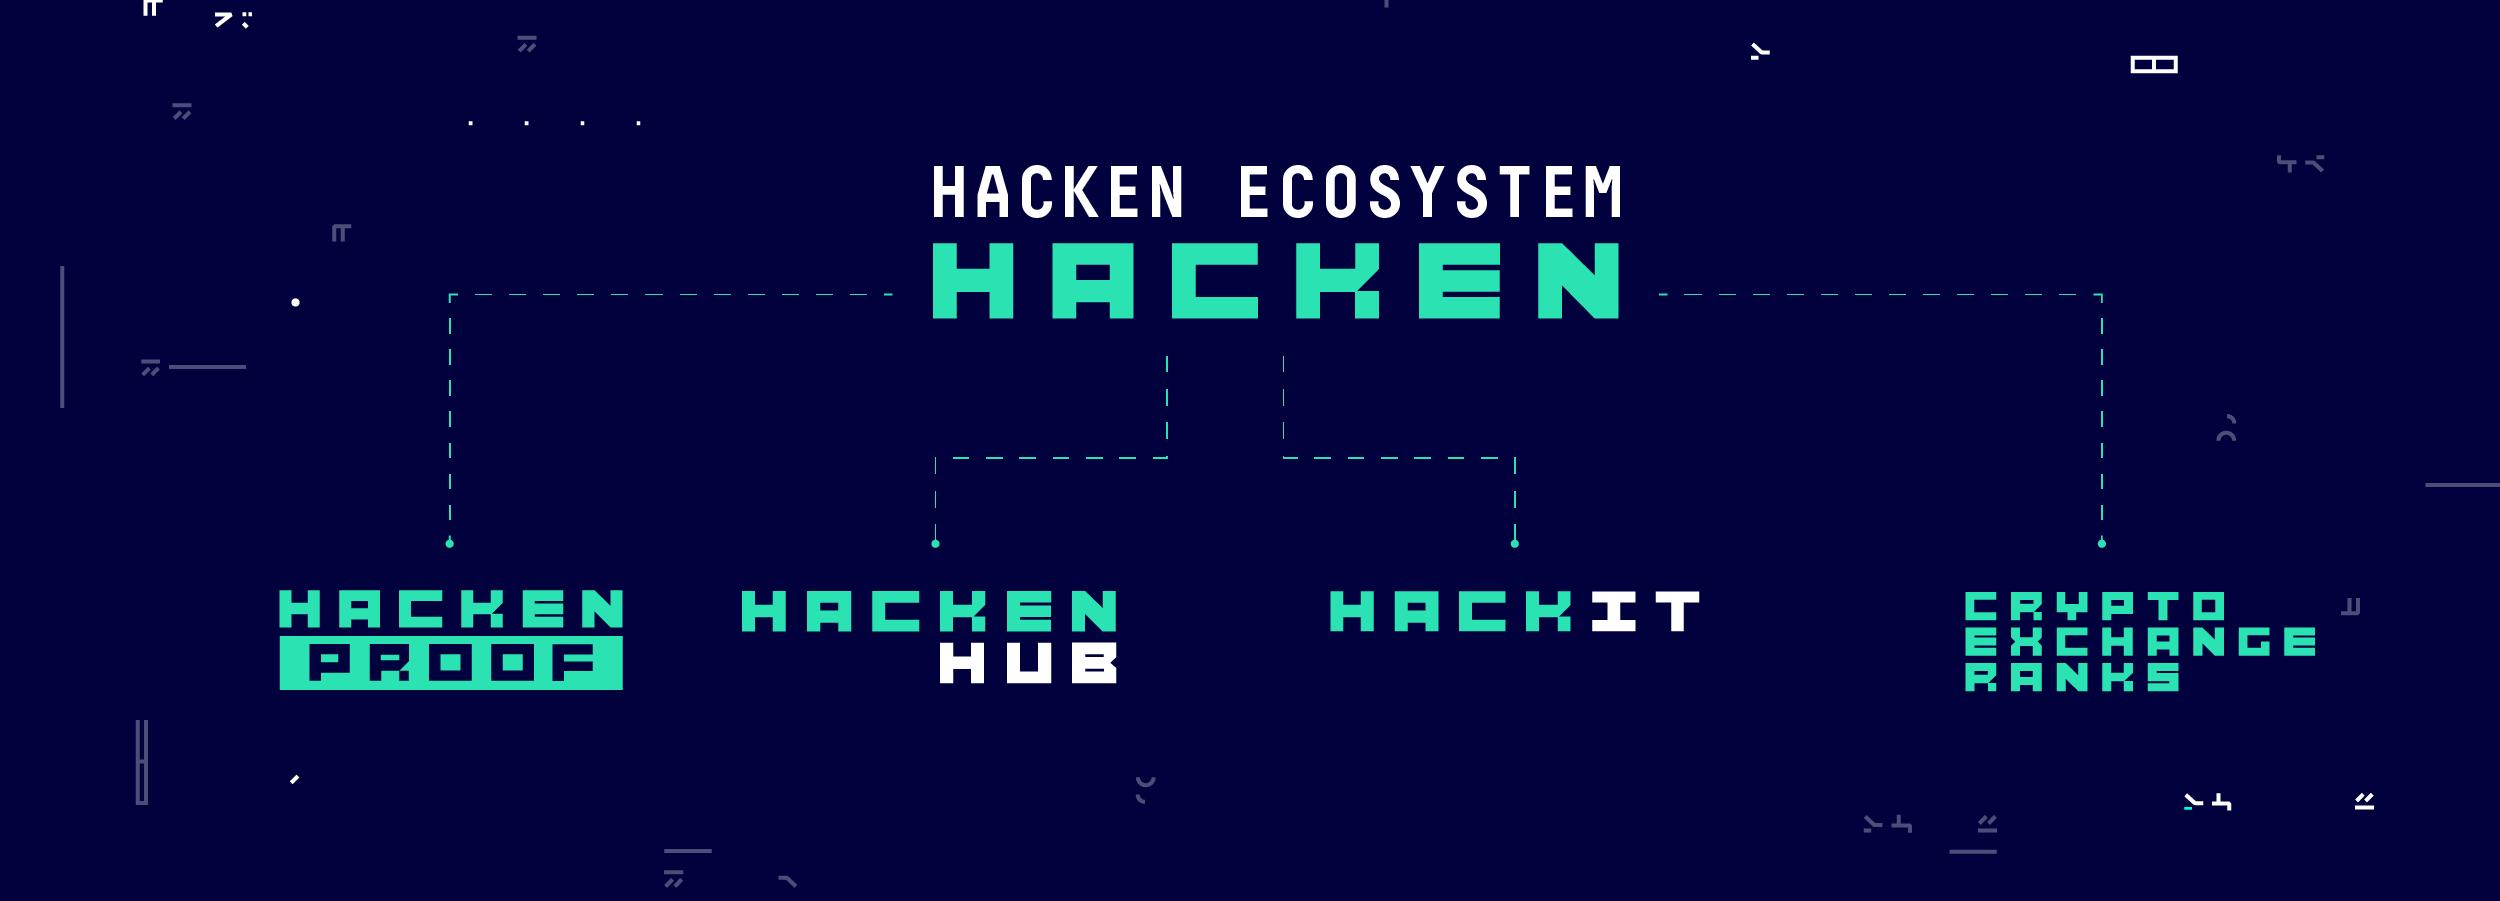 Hacken Ecosystem